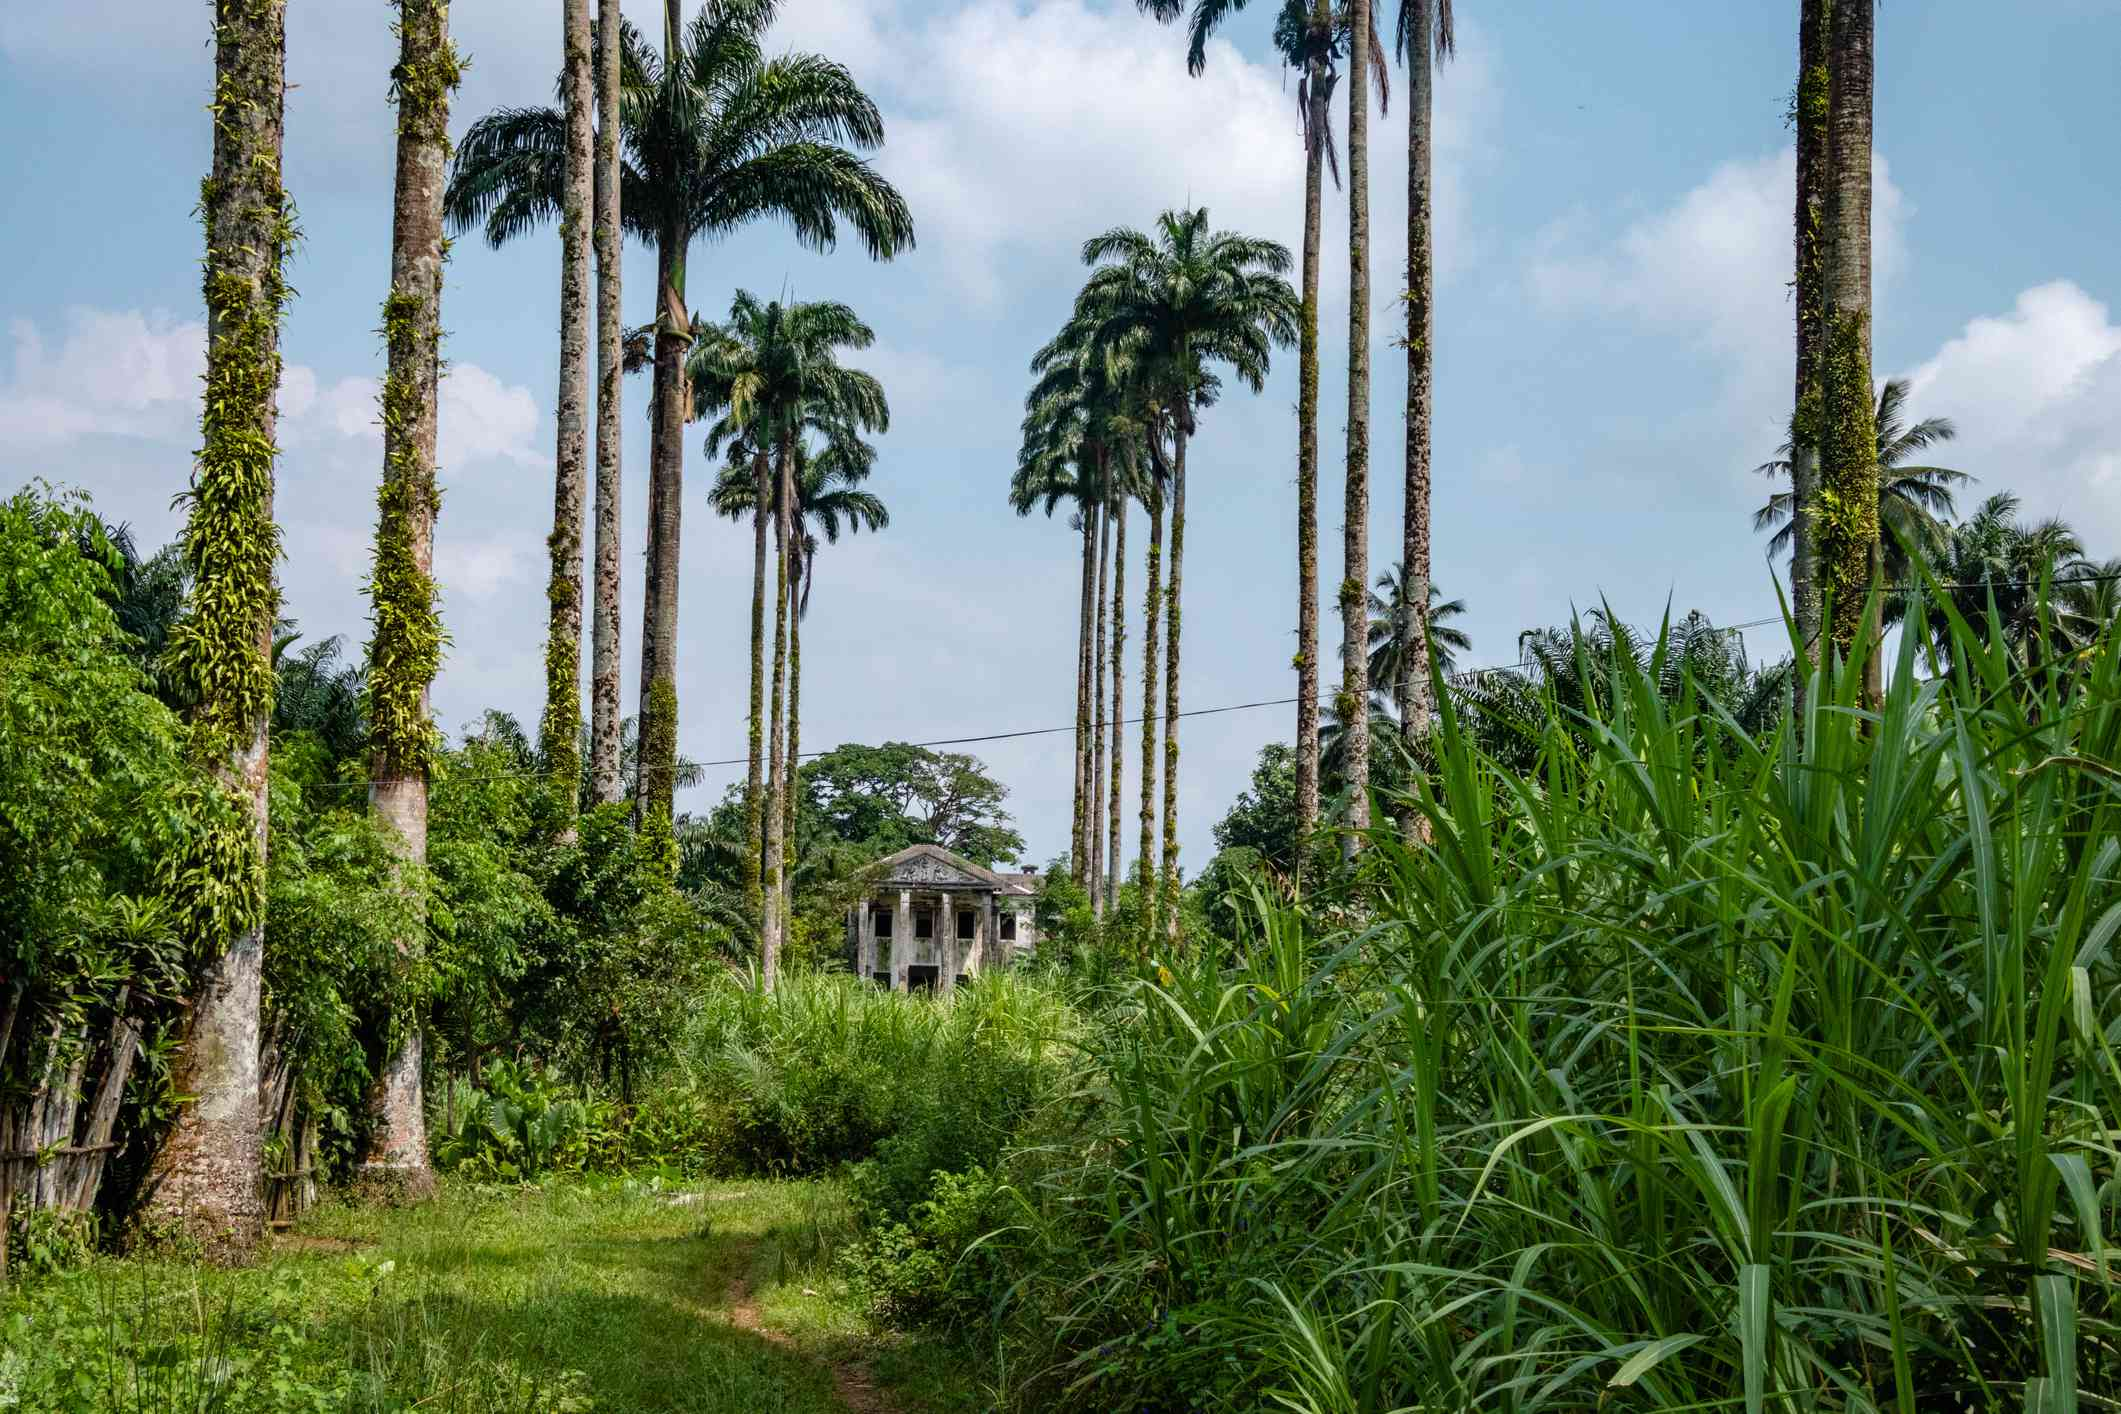 Ko Rural scenery of Kut Island (Koh Kood) - blue sky, dirt road and coconut palm trees